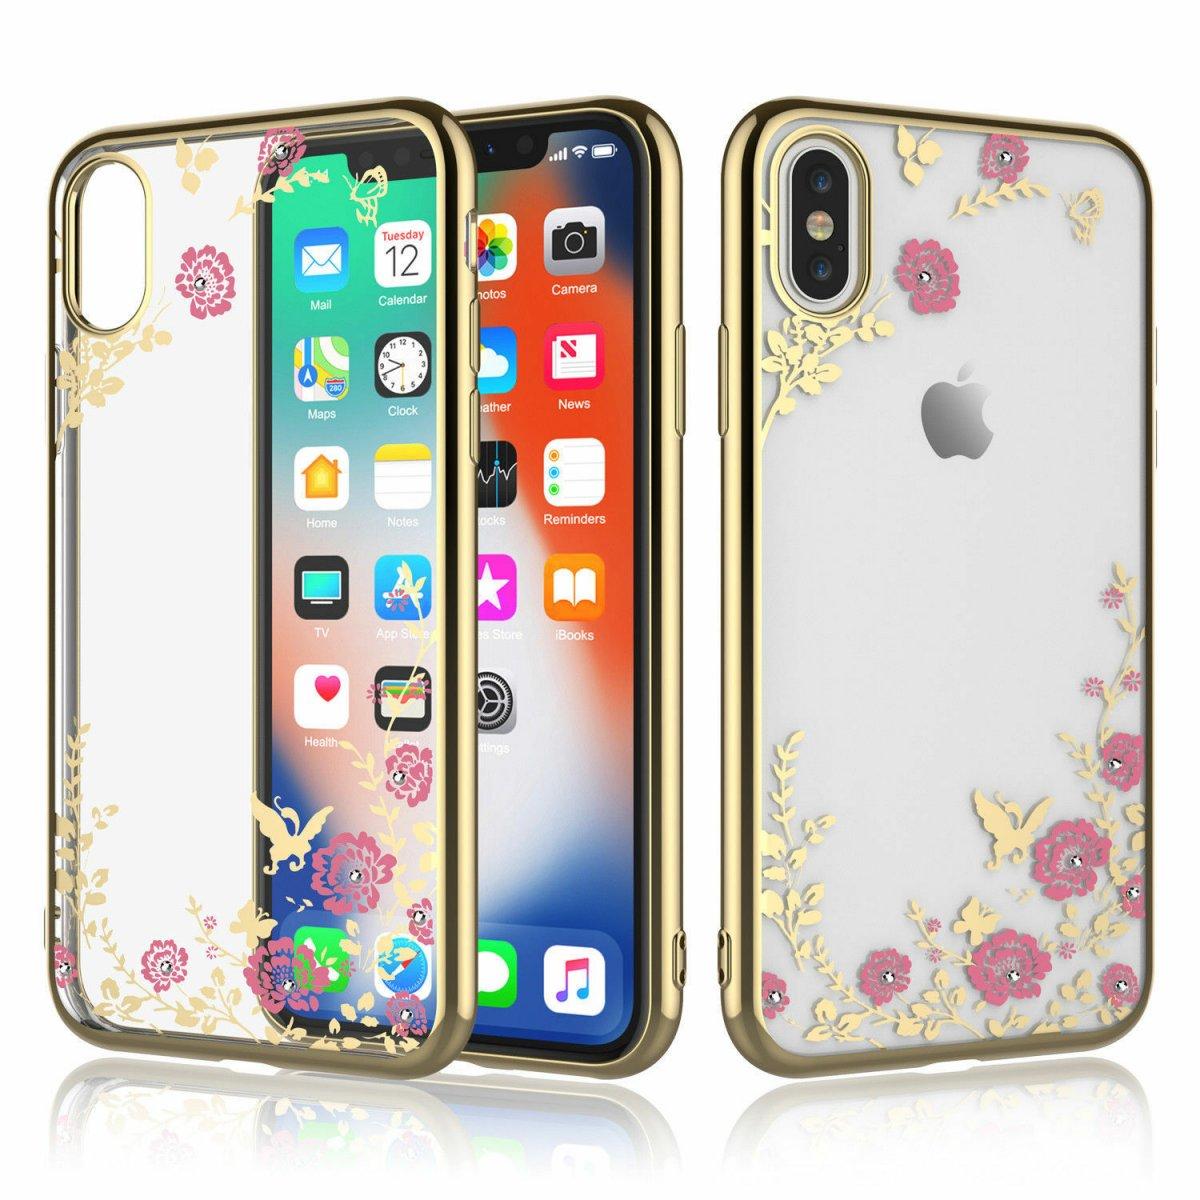 Pouzdro Forcell Diamond Case iPhone Xs Max - Zlatá